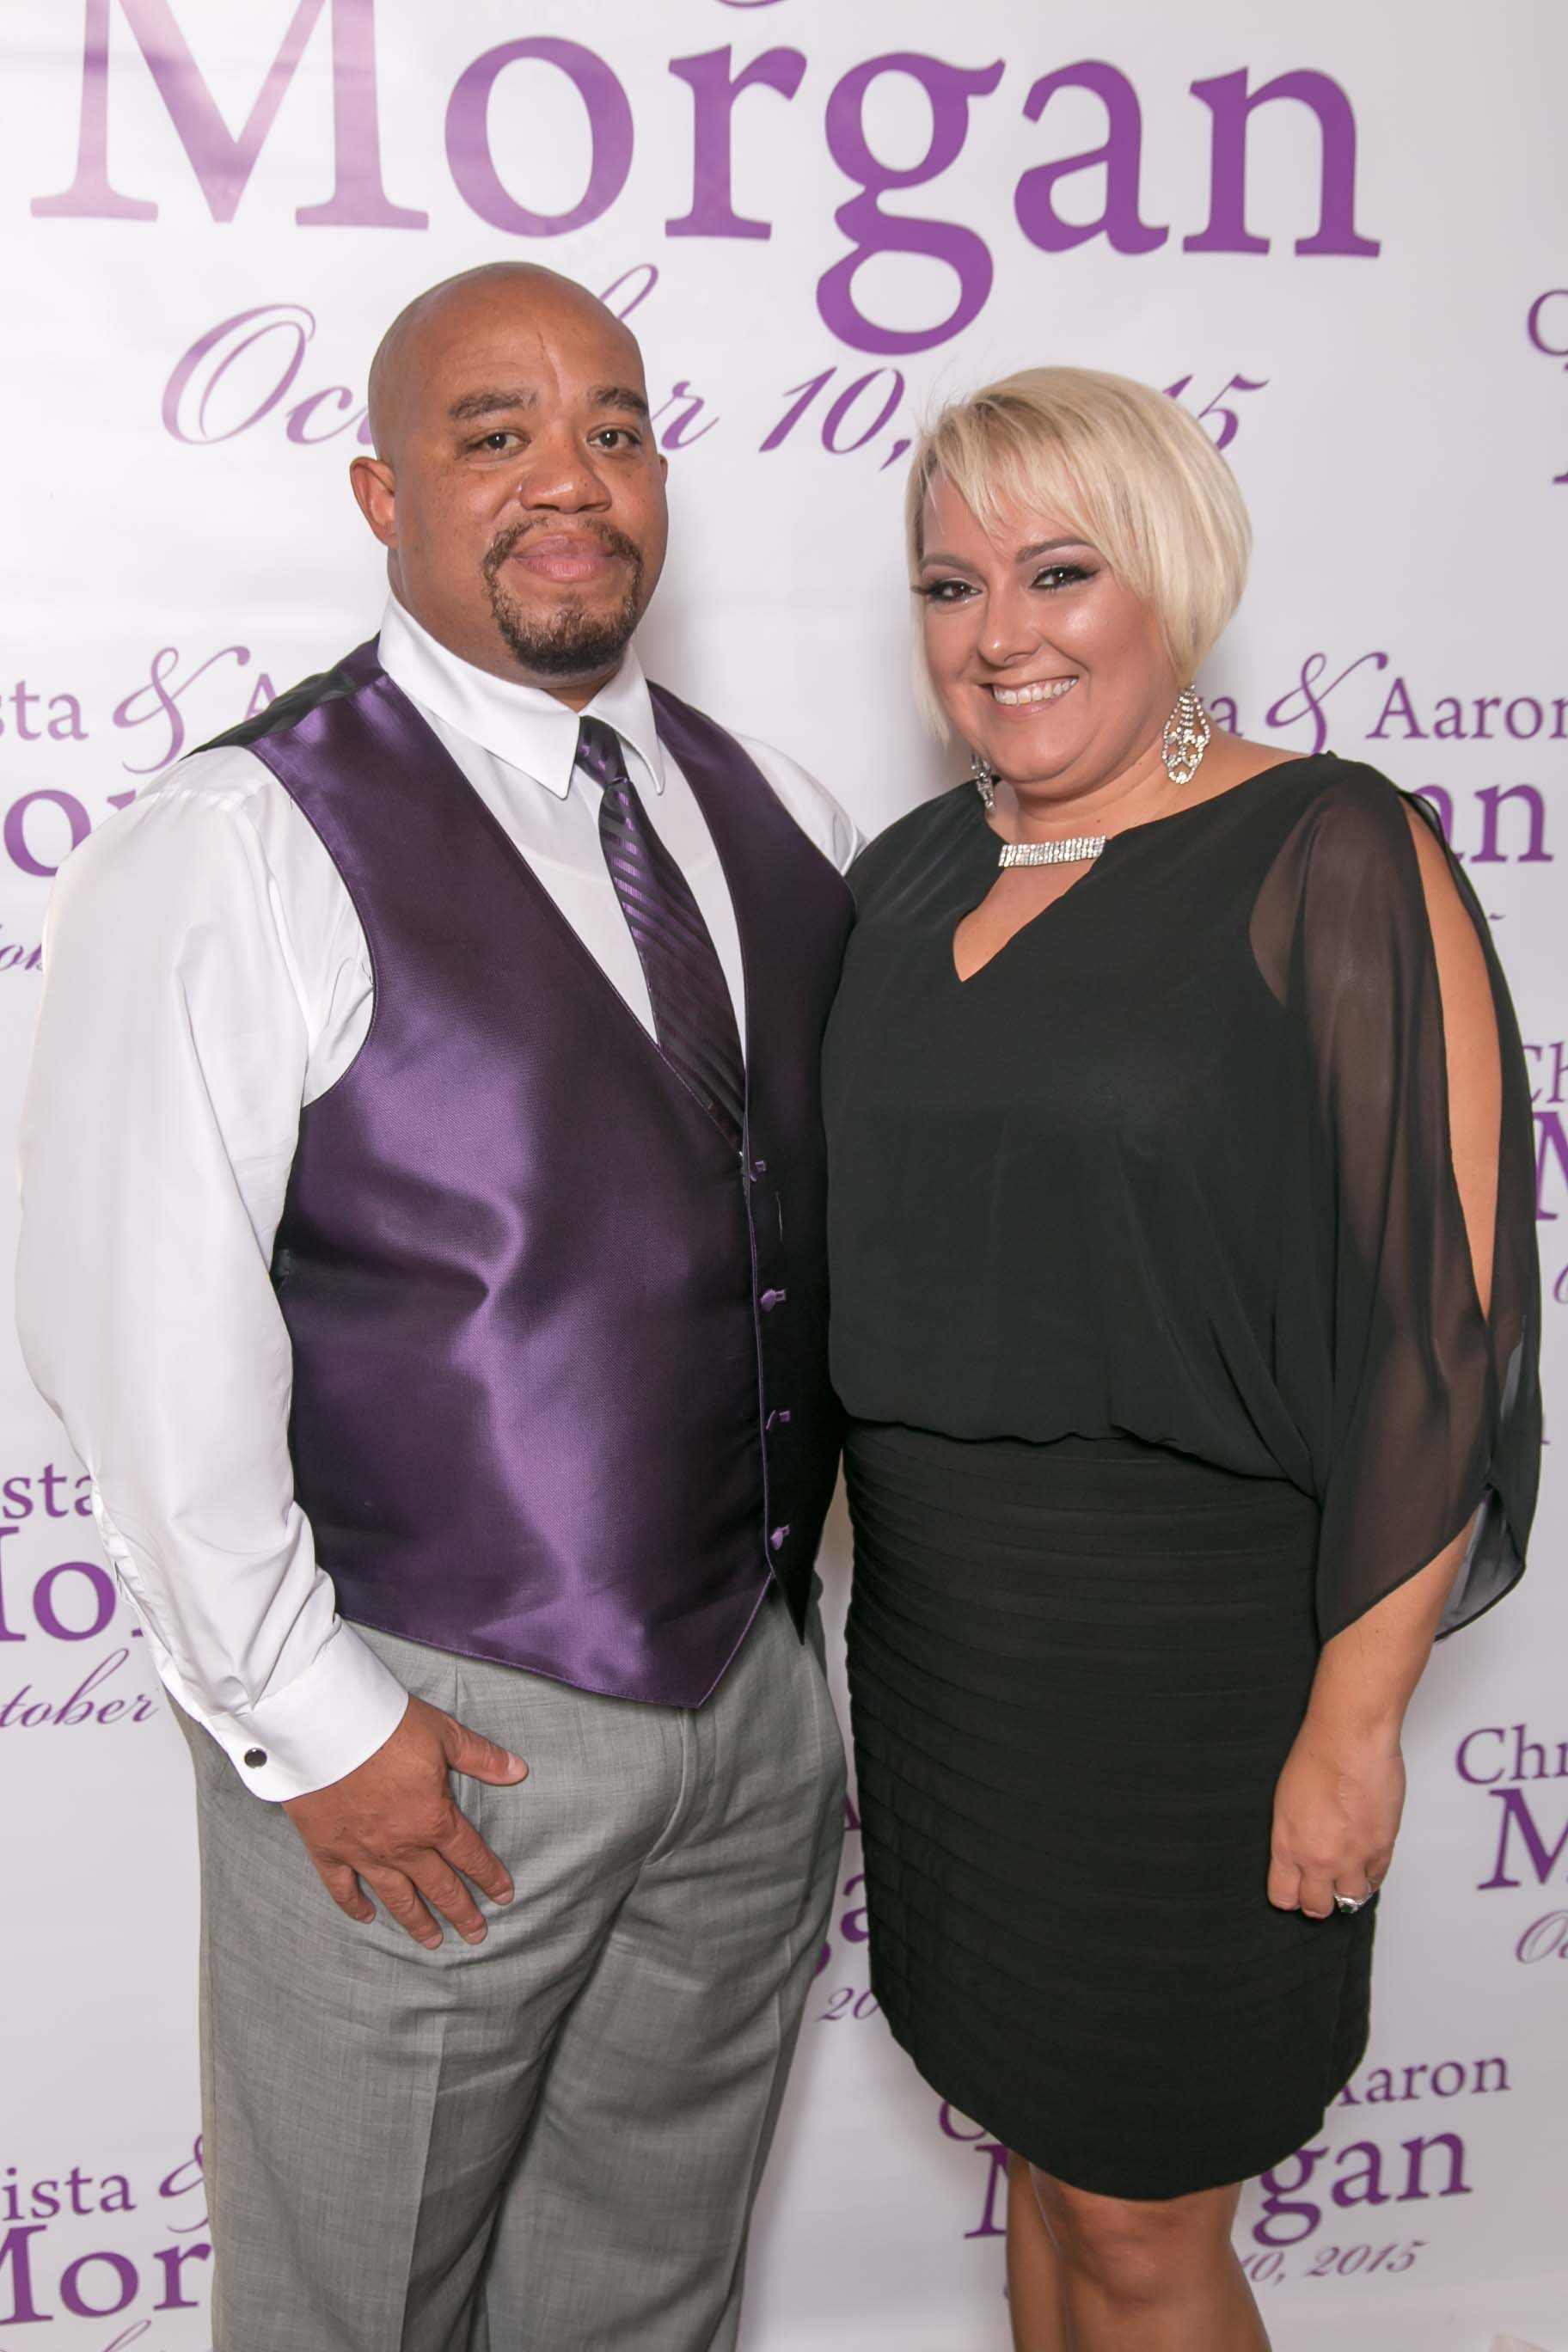 Christa&Aaron-0260